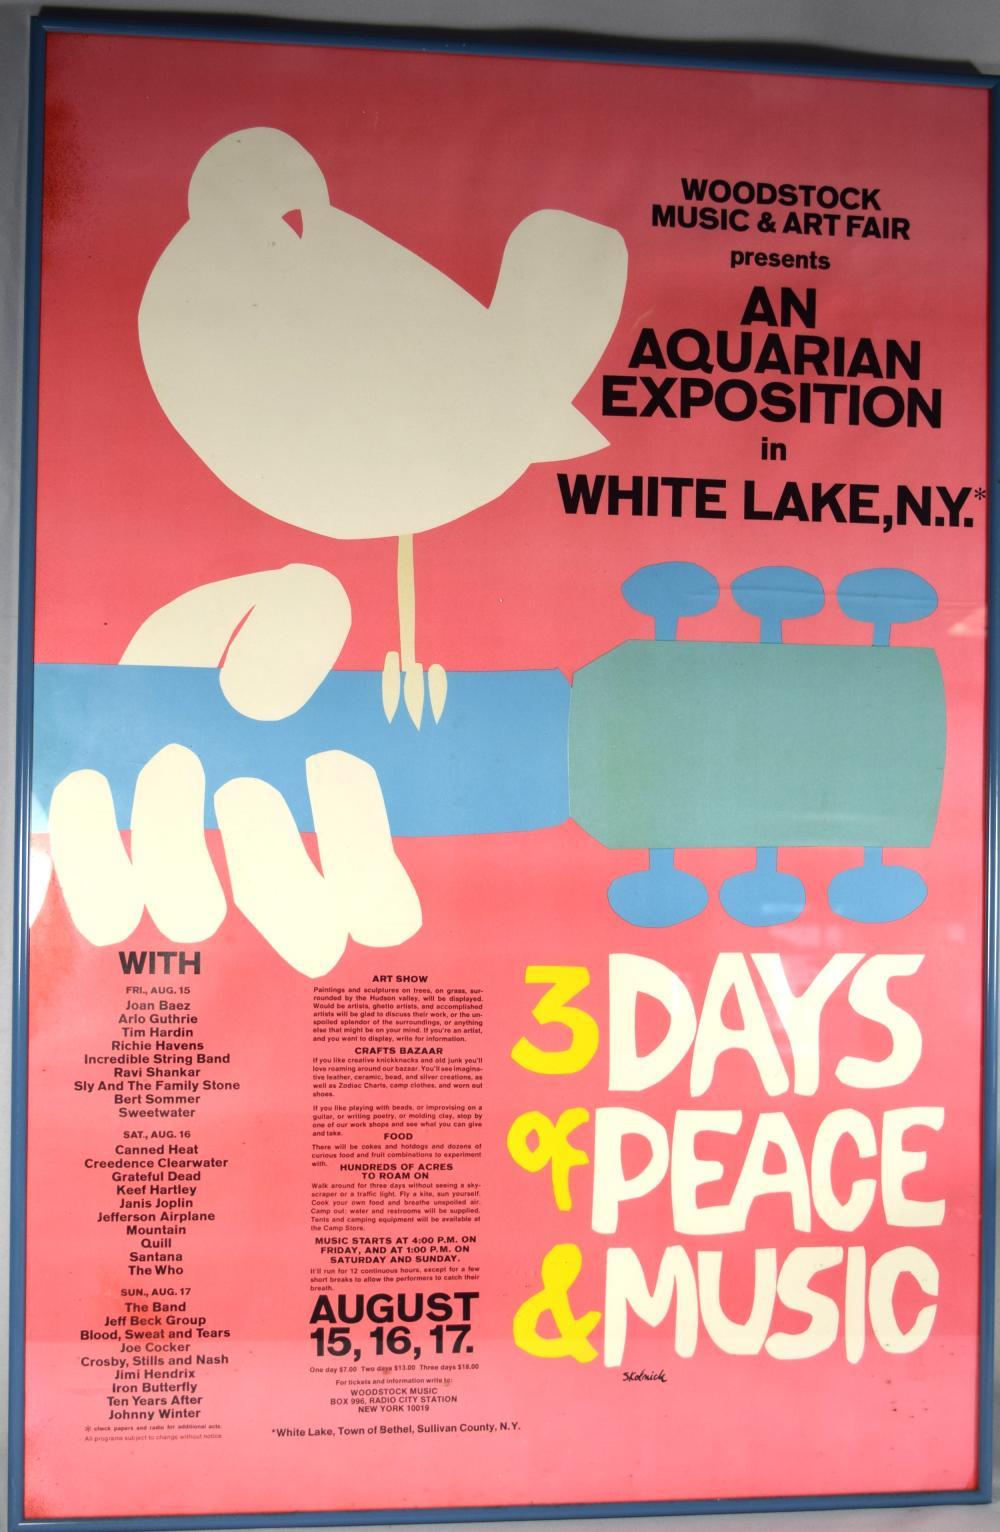 ORIGINAL 1969 WOODSTOCK MUSIC FESTIVAL POSTER: